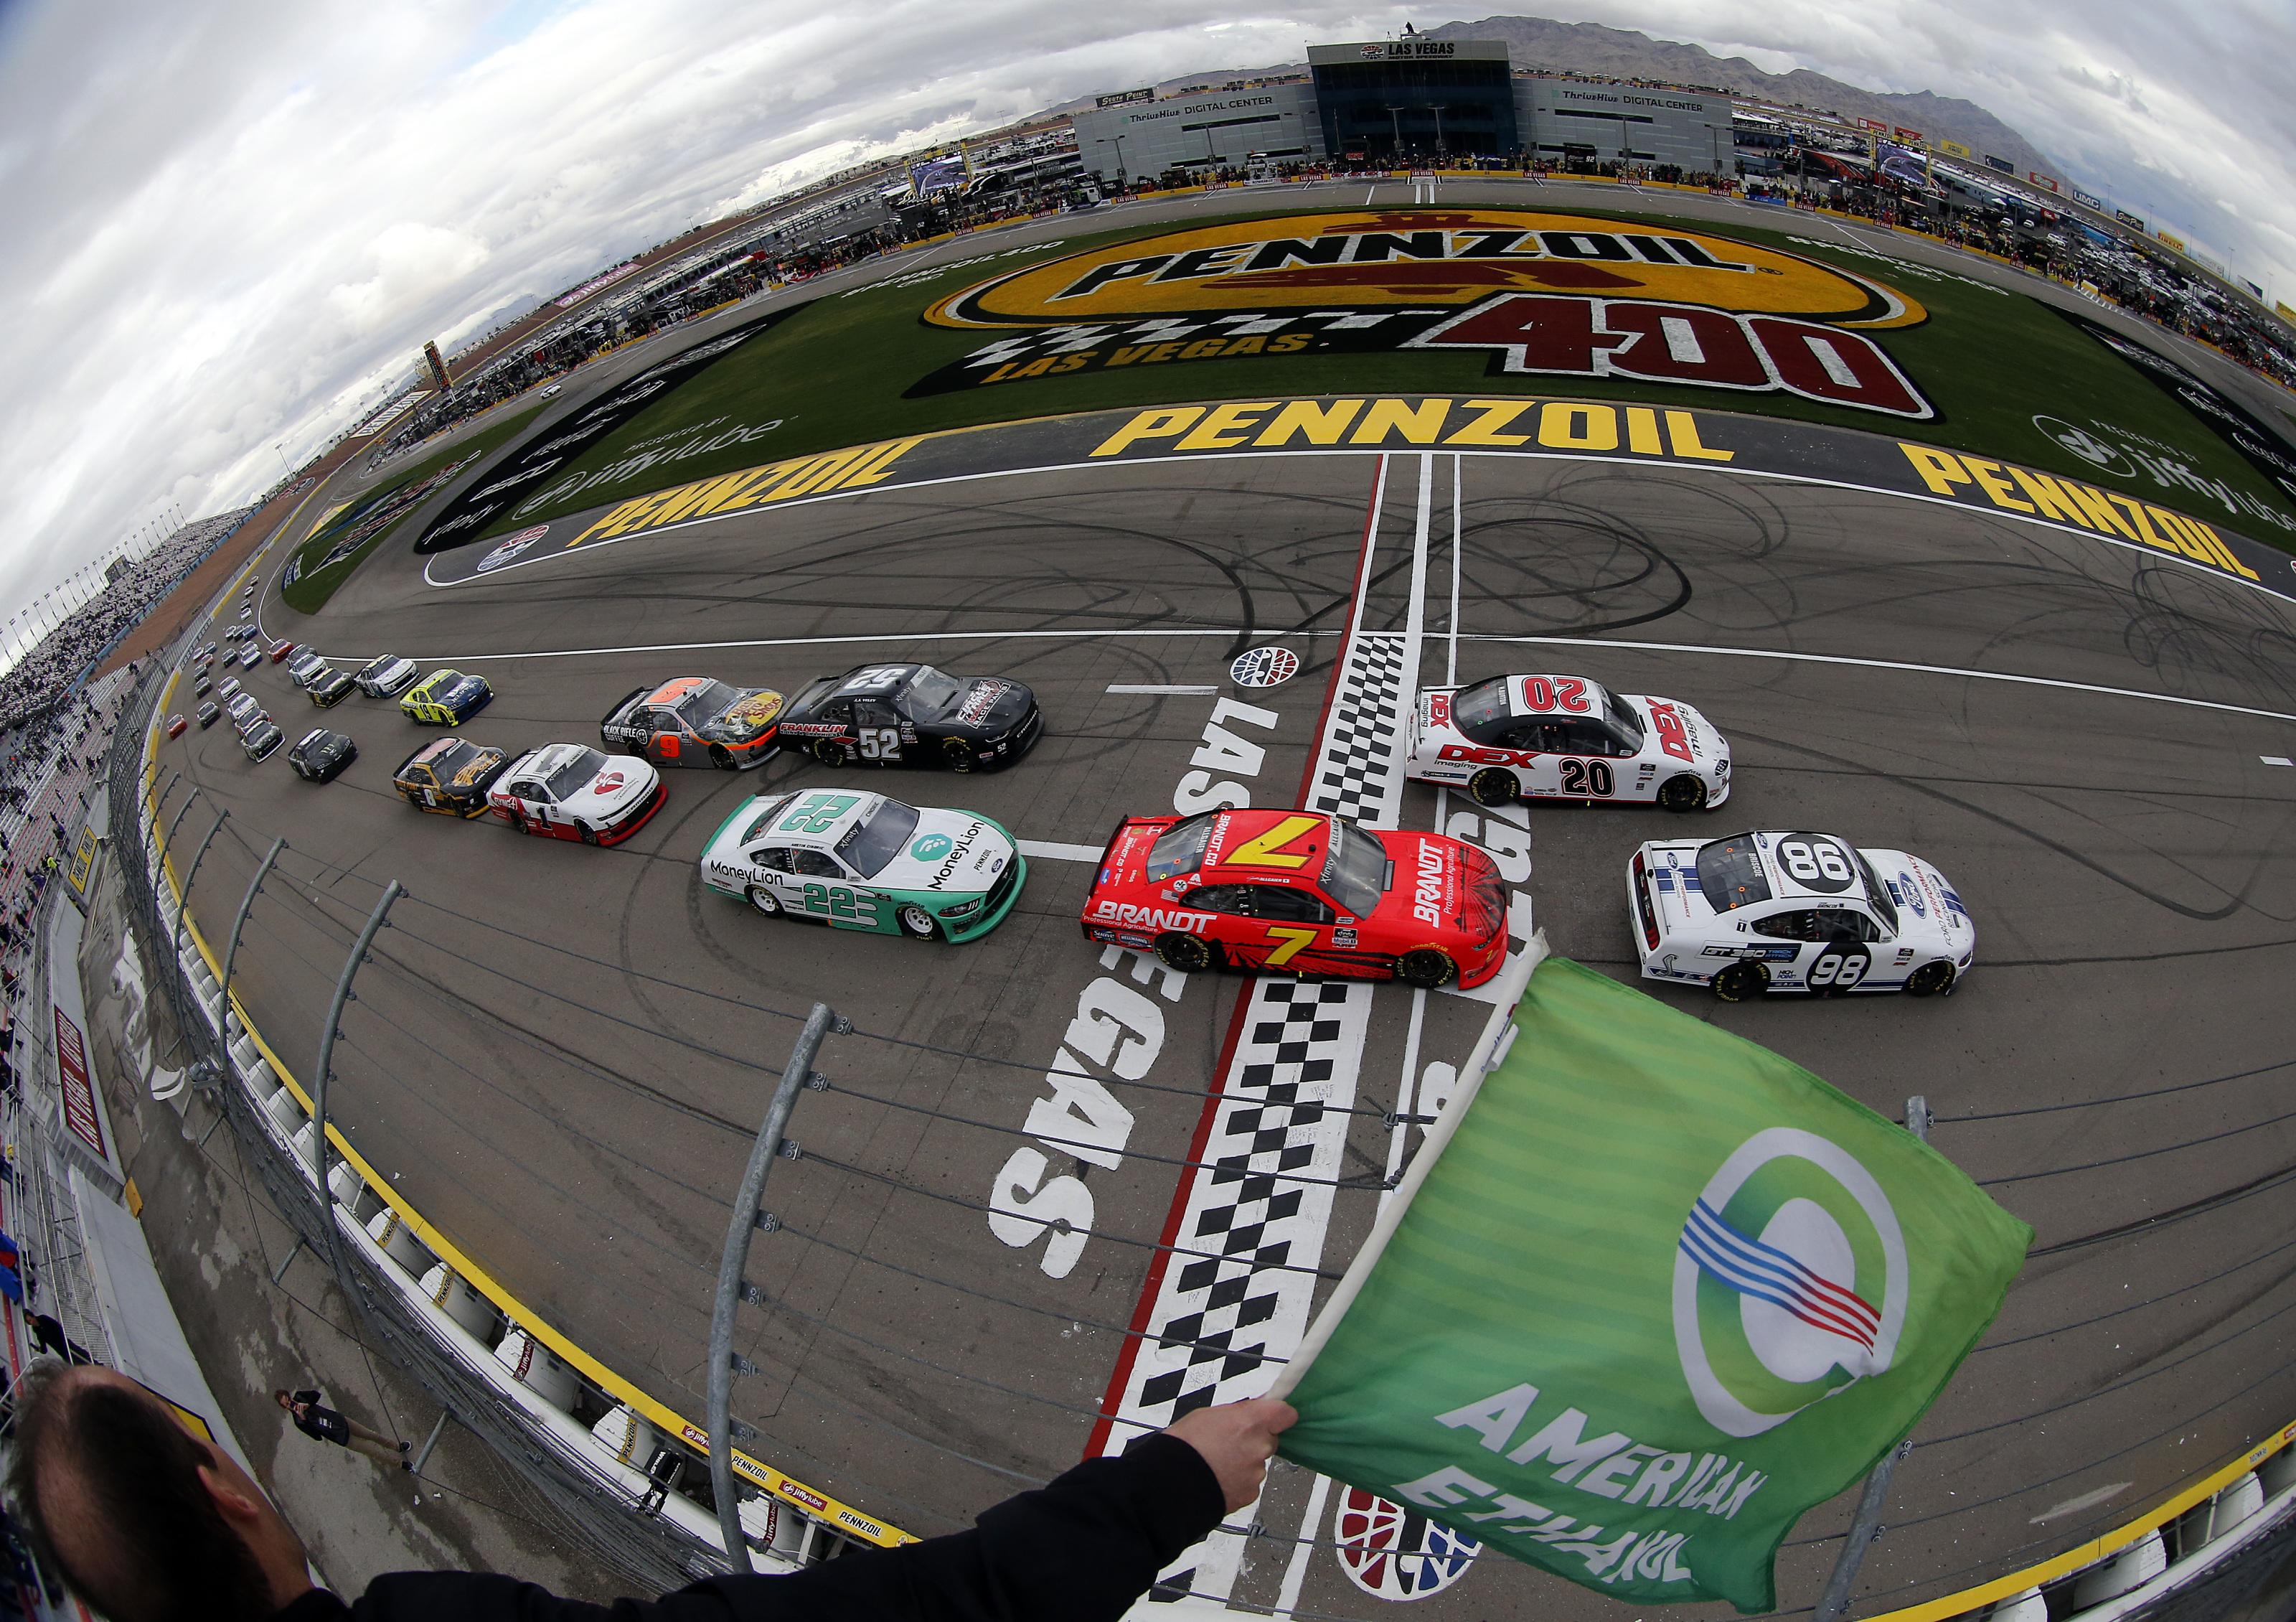 Rain postpones another NASCAR race